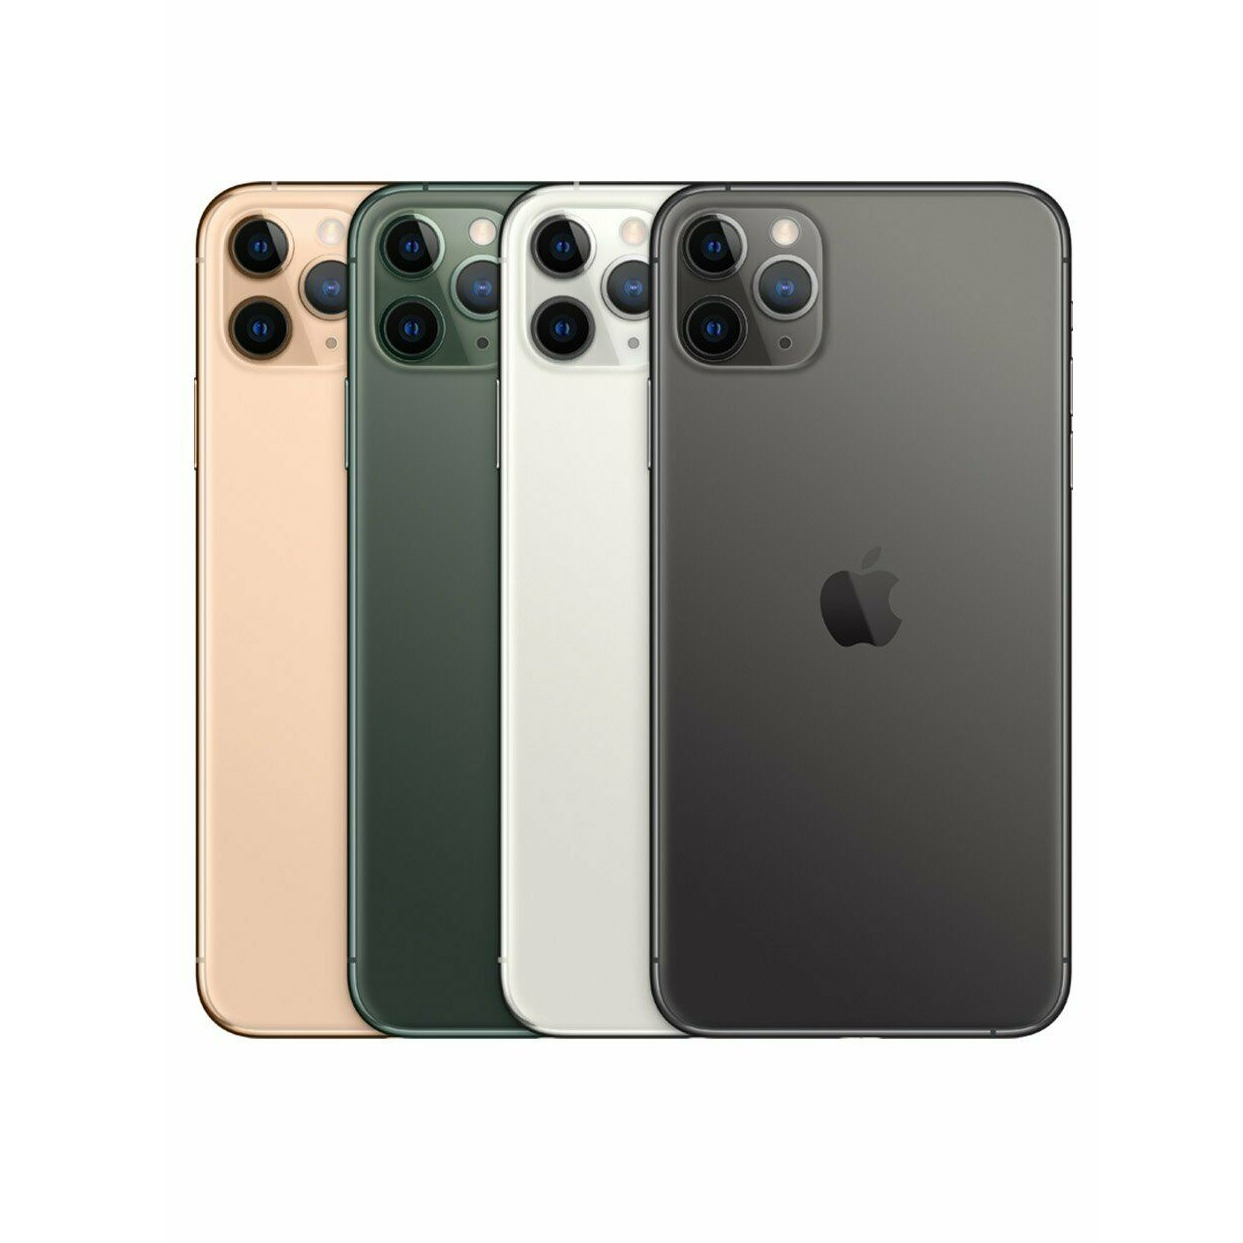 閃購:蘋果 iPhone 11 Pro Max熱賣 手慢無貨